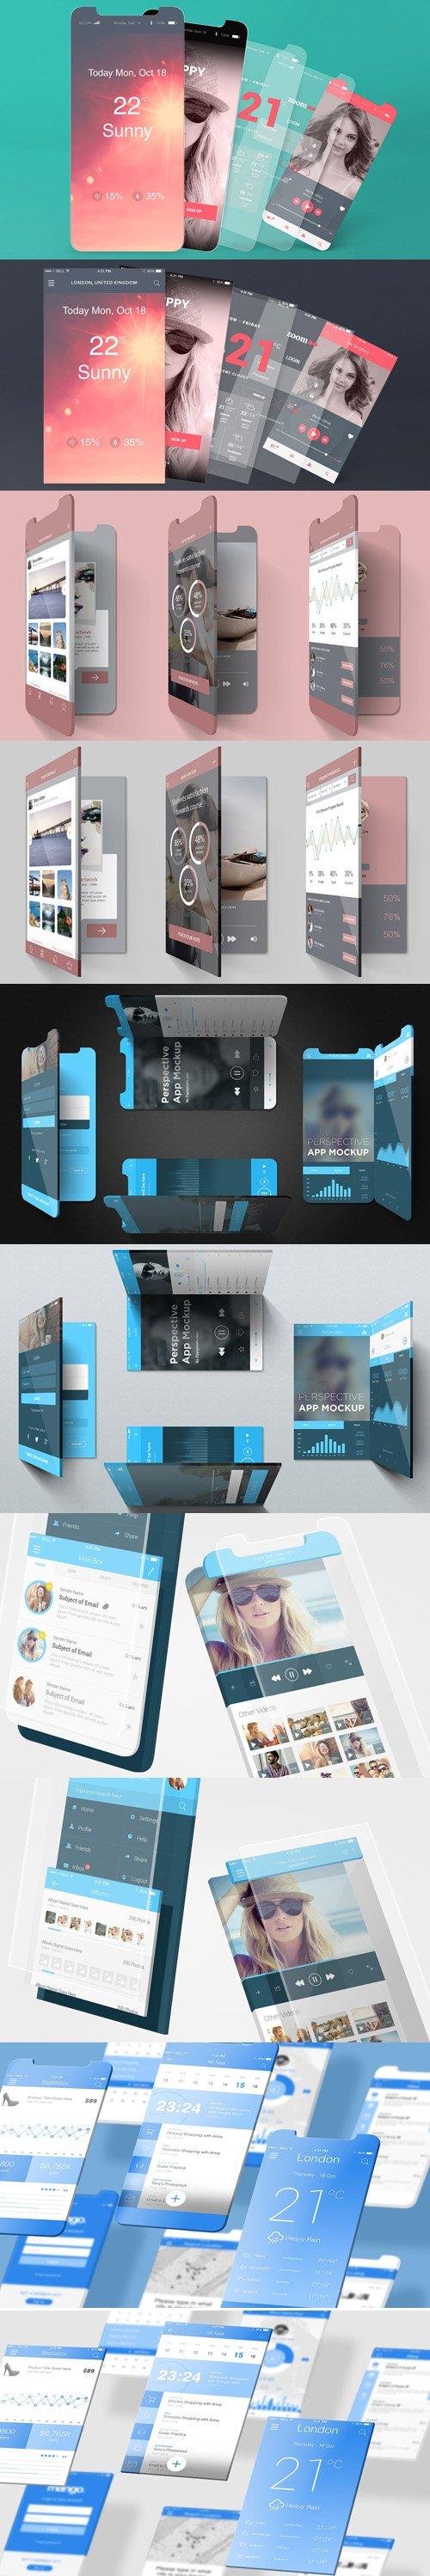 Multi iOS App Screens PSD Mockups for iPhone